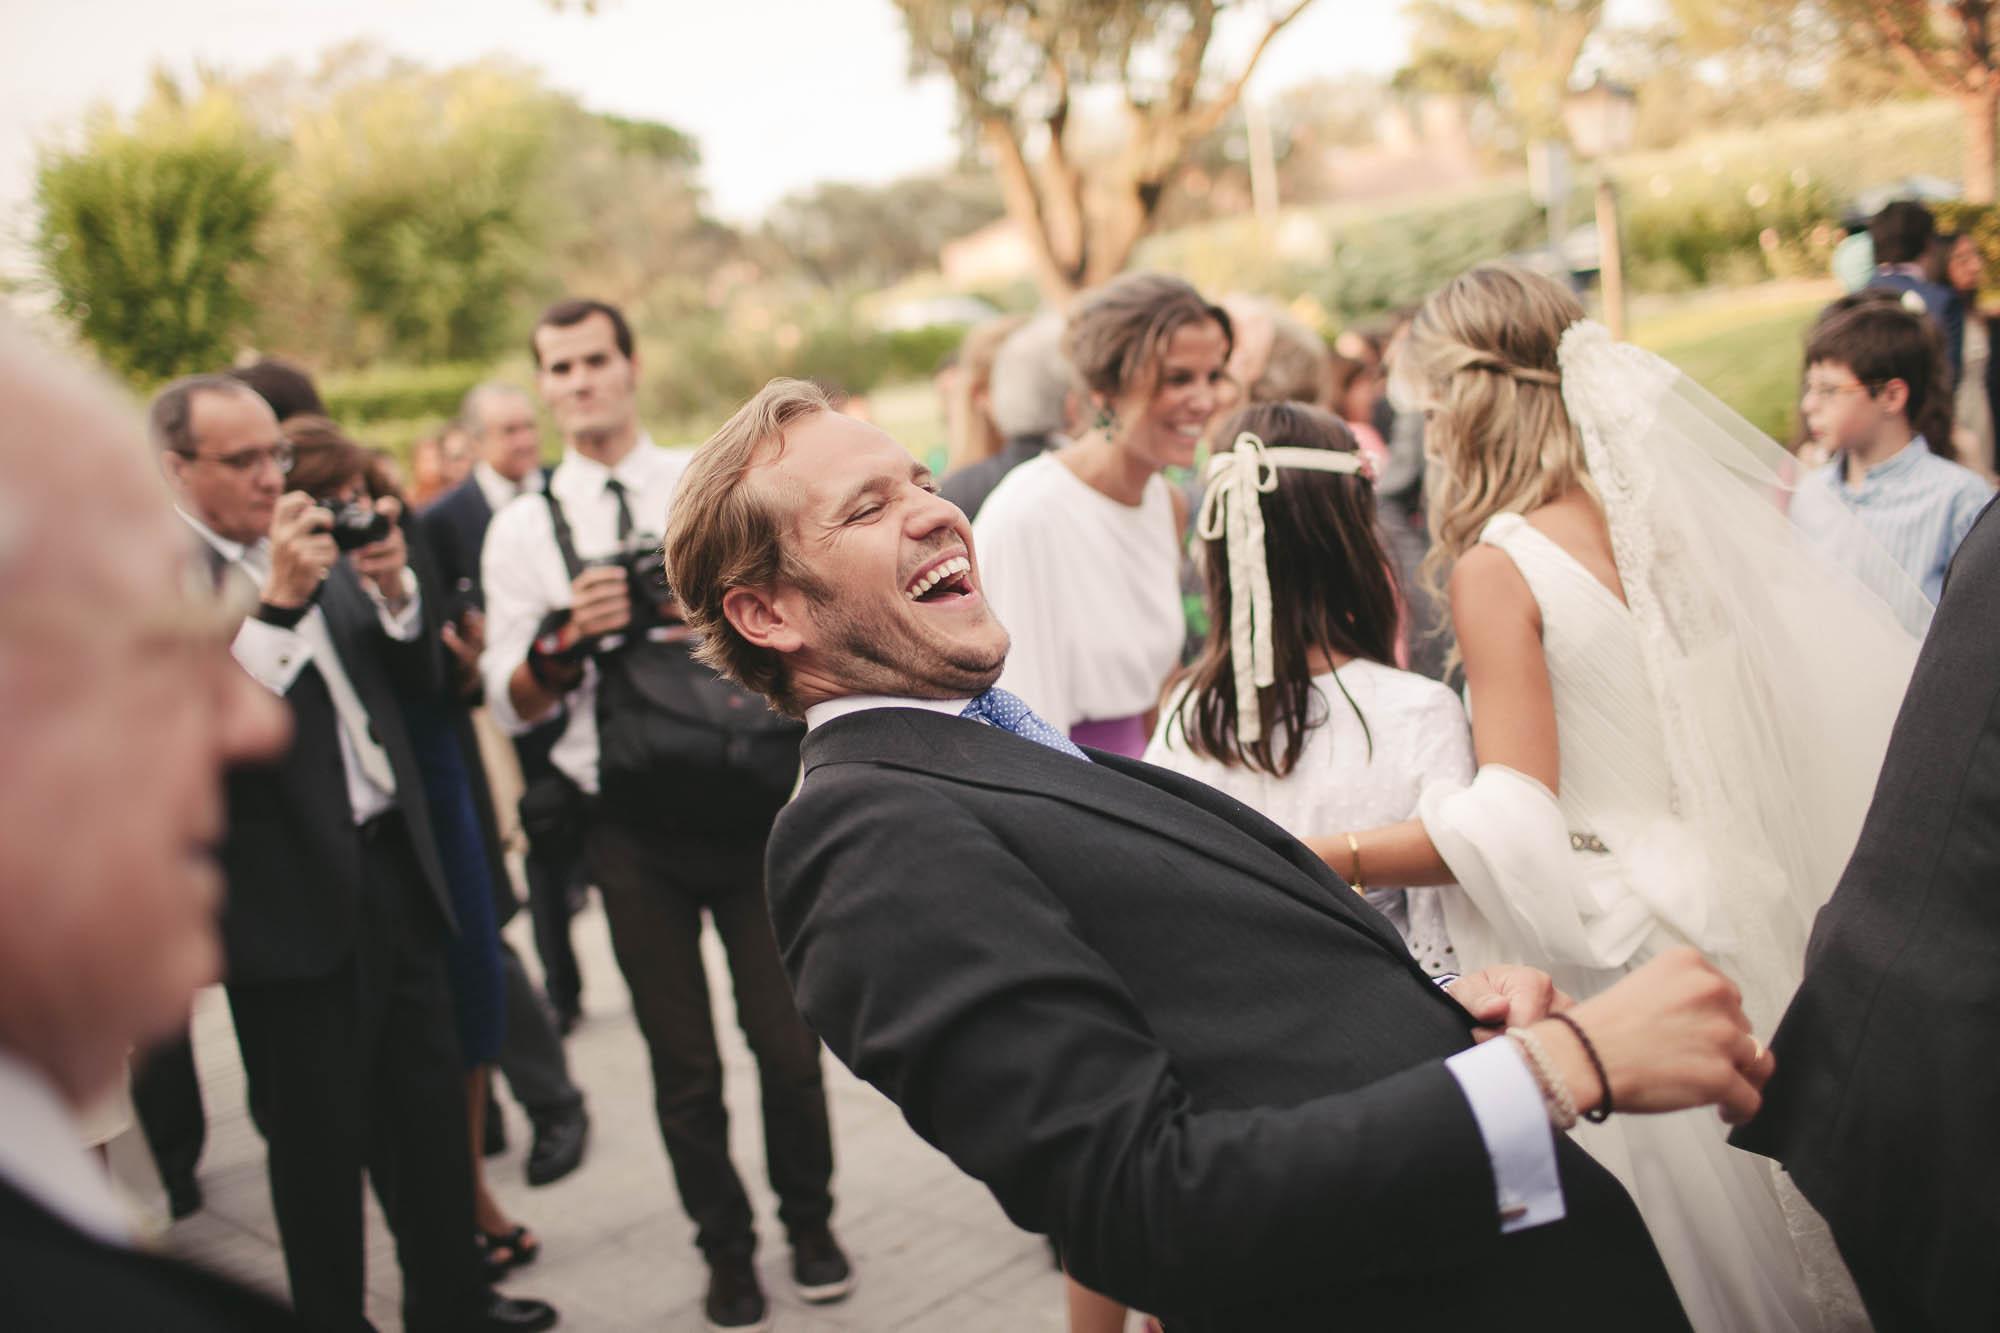 El novio riendo